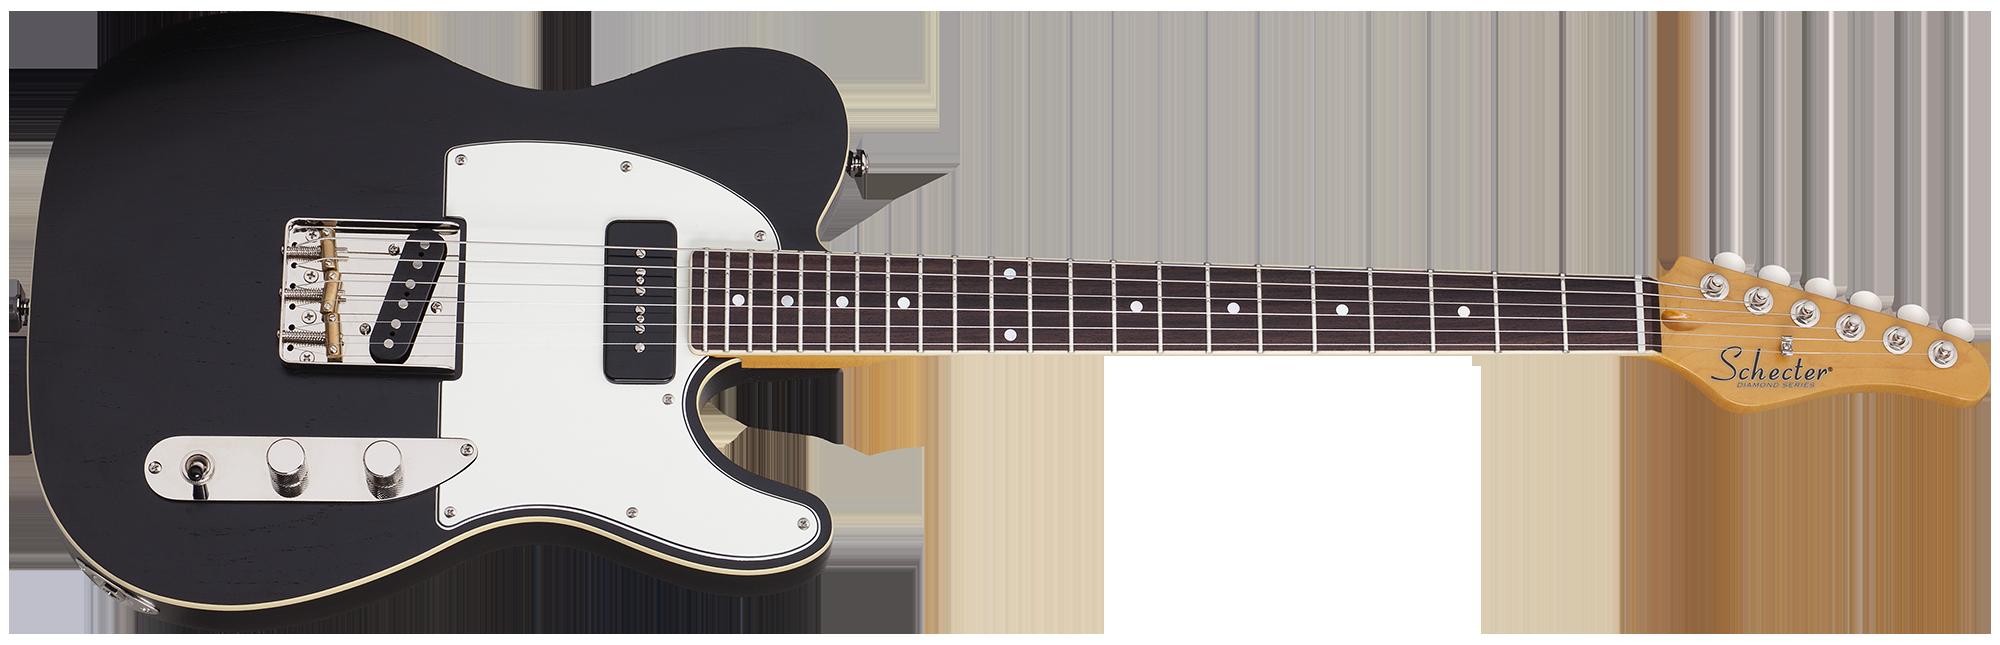 PT Special Black Pearl (BLKP) SKU #666